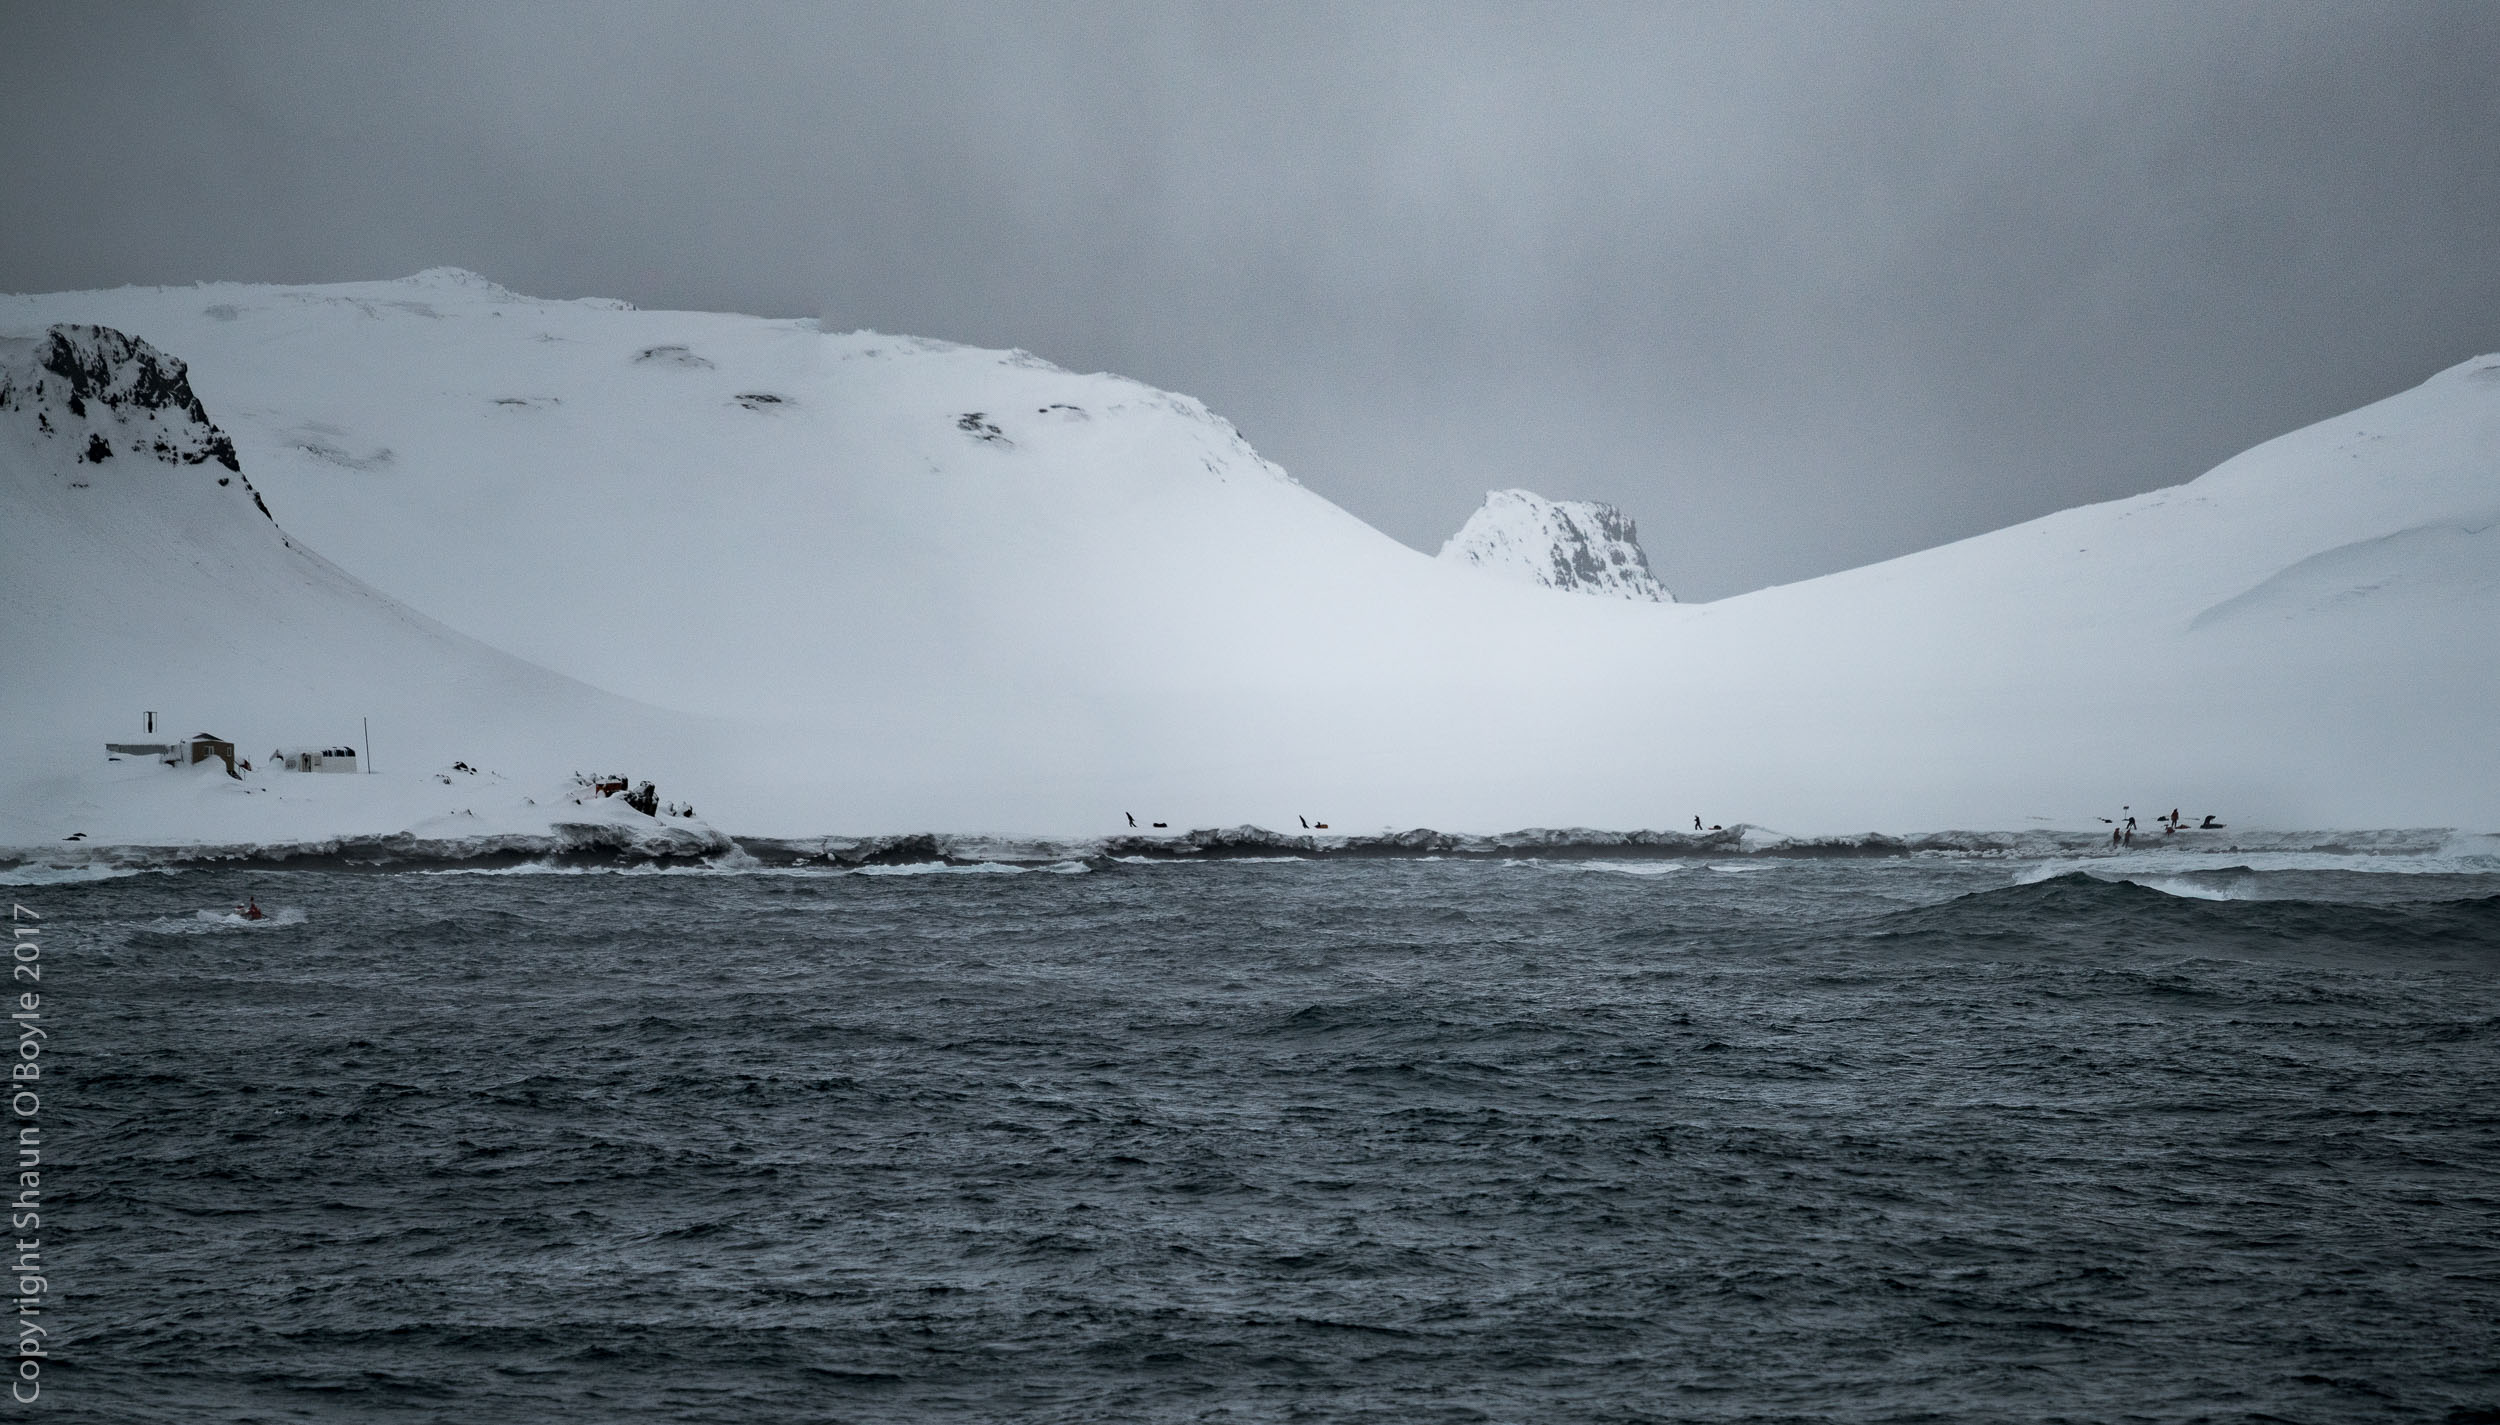 Sledging loads from the zodiac landing to the NOAA hut on Cape Shirreff, South Shetland Islands.